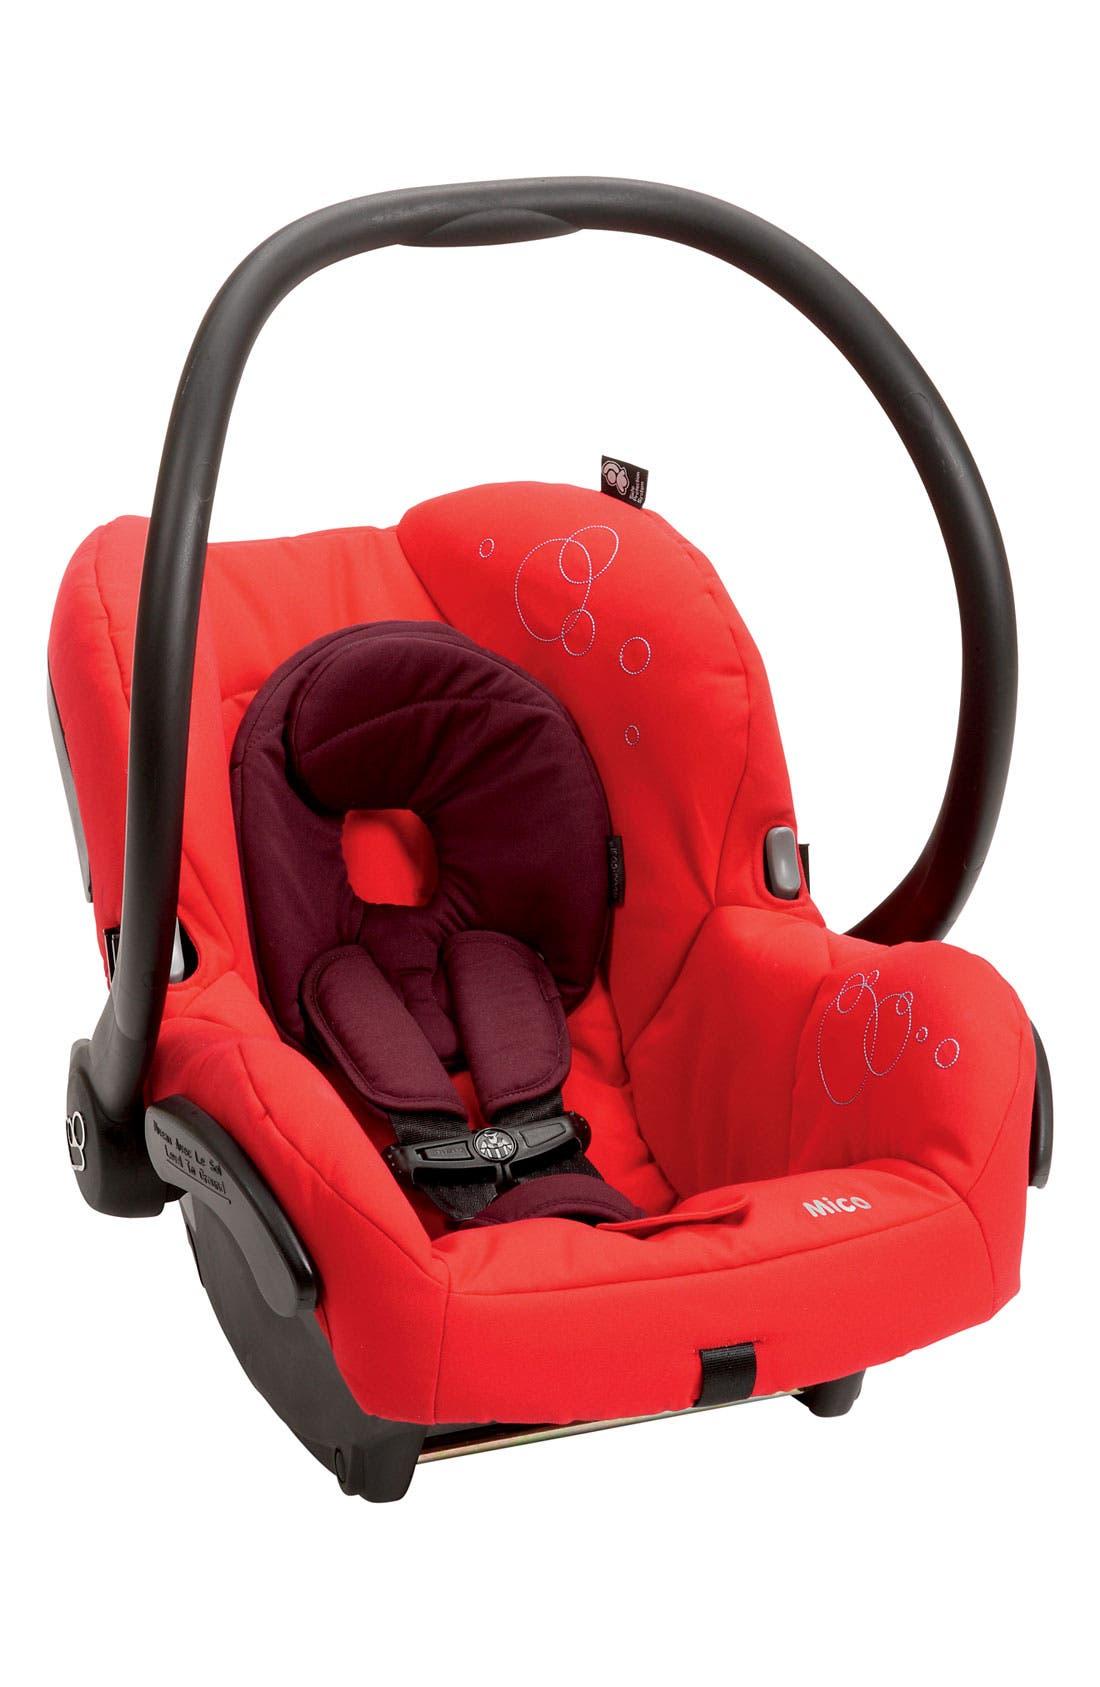 Alternate Image 1 Selected - Maxi-Cosi® 'Mico' Infant Car Seat